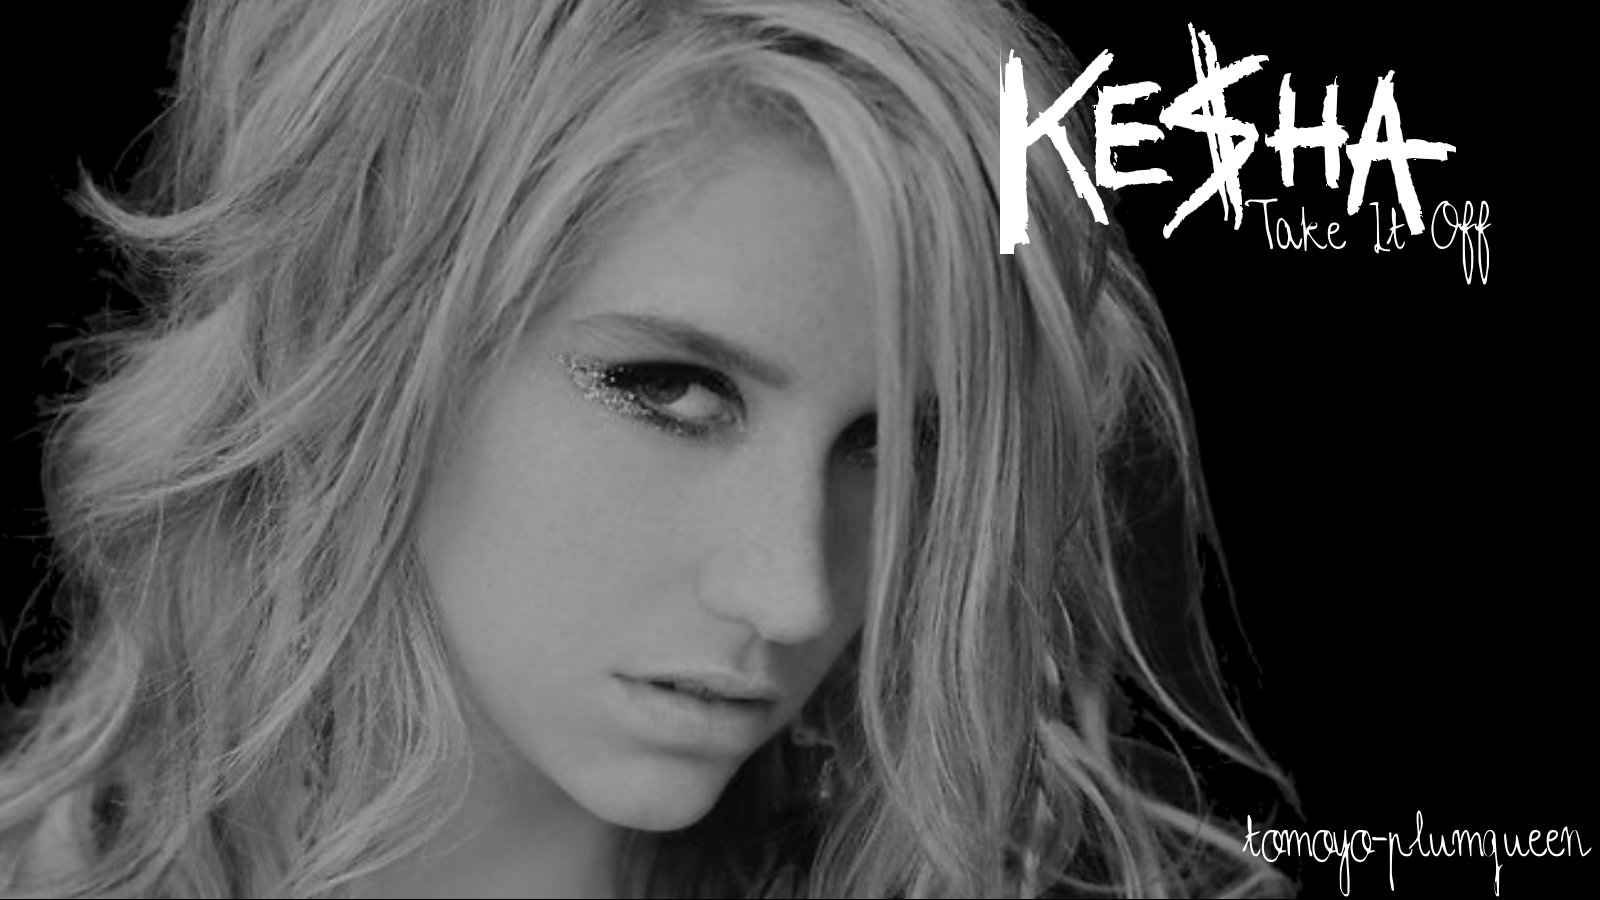 http://3.bp.blogspot.com/-aR9N48FXdis/TzaLB_Lh8mI/AAAAAAAAB8E/0jxvqFPvJsU/s1600/Kesha%2BBiography.jpg